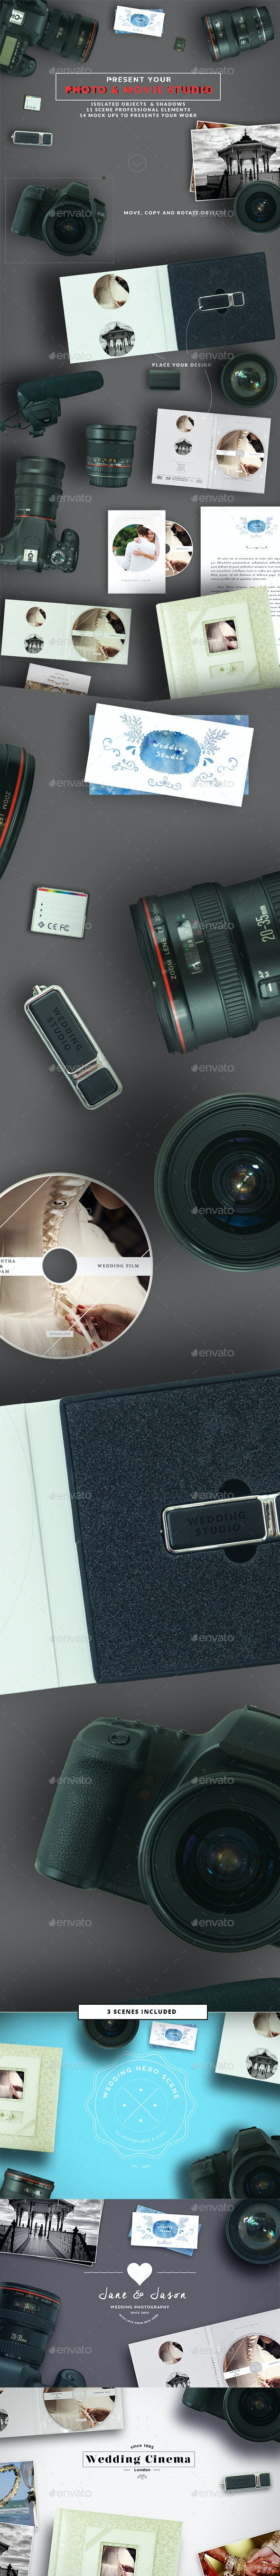 DSLR Photo / Video Mock Up Creator - Hero Images Graphics